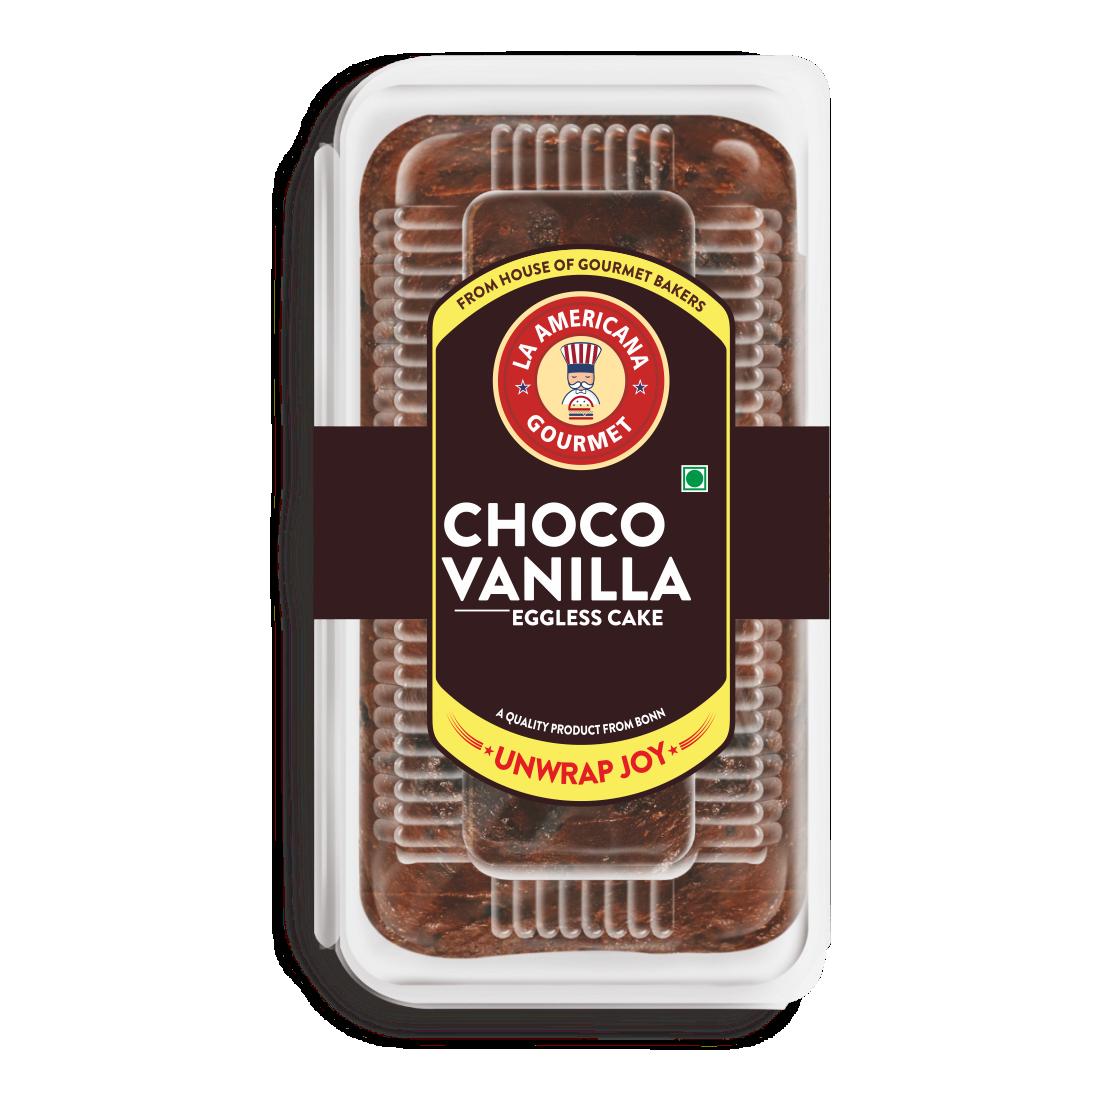 LA Americana Eggless Choco Vanilla Cake 200g (Pack of 4)